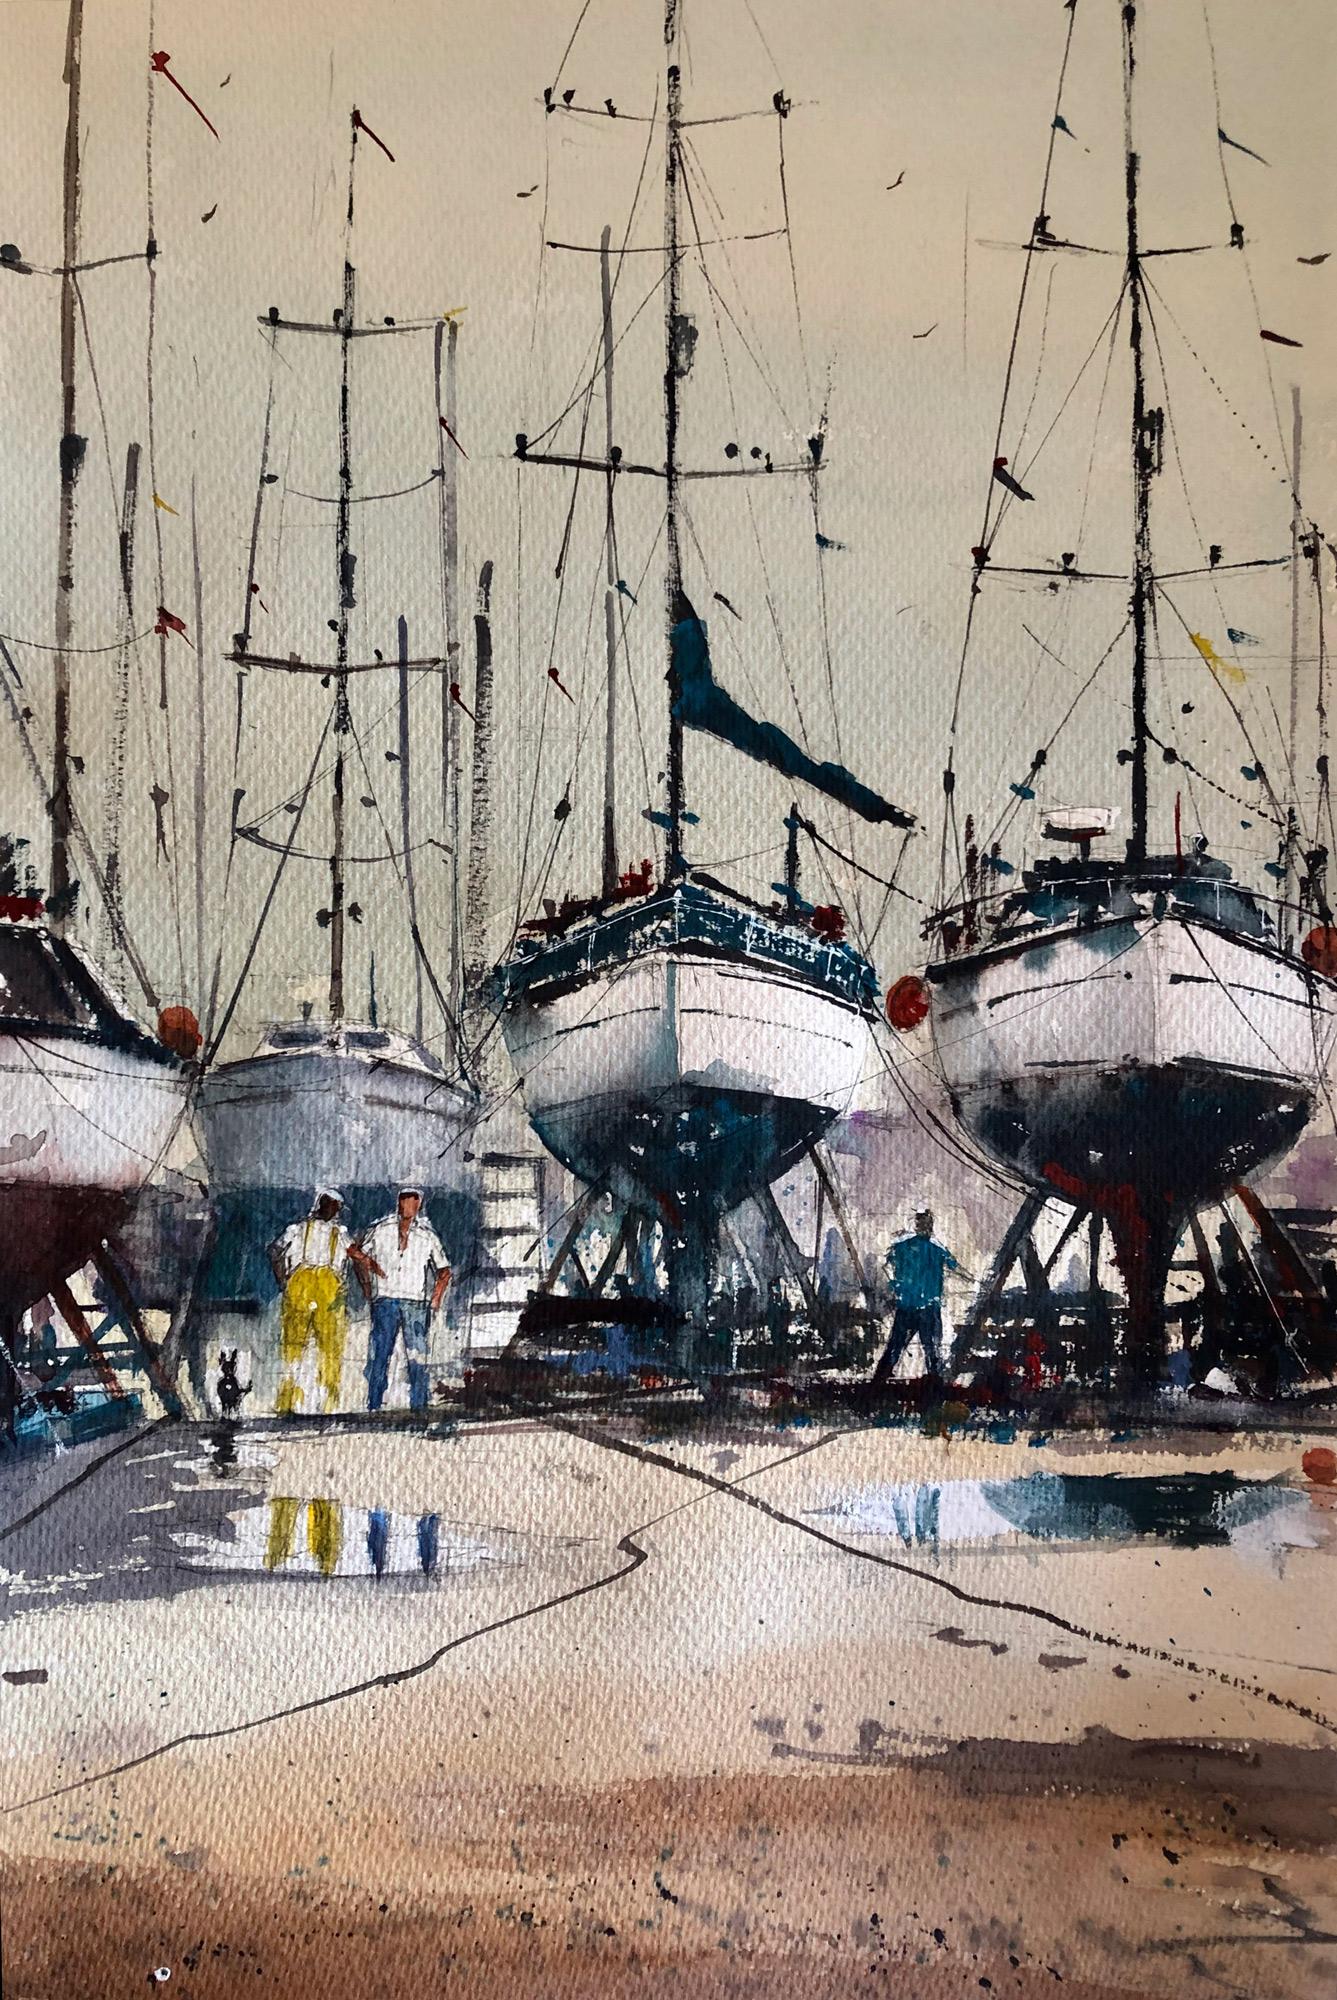 Surinder Beerh | Boat Yard | Watercolour | 49x67cm | £175